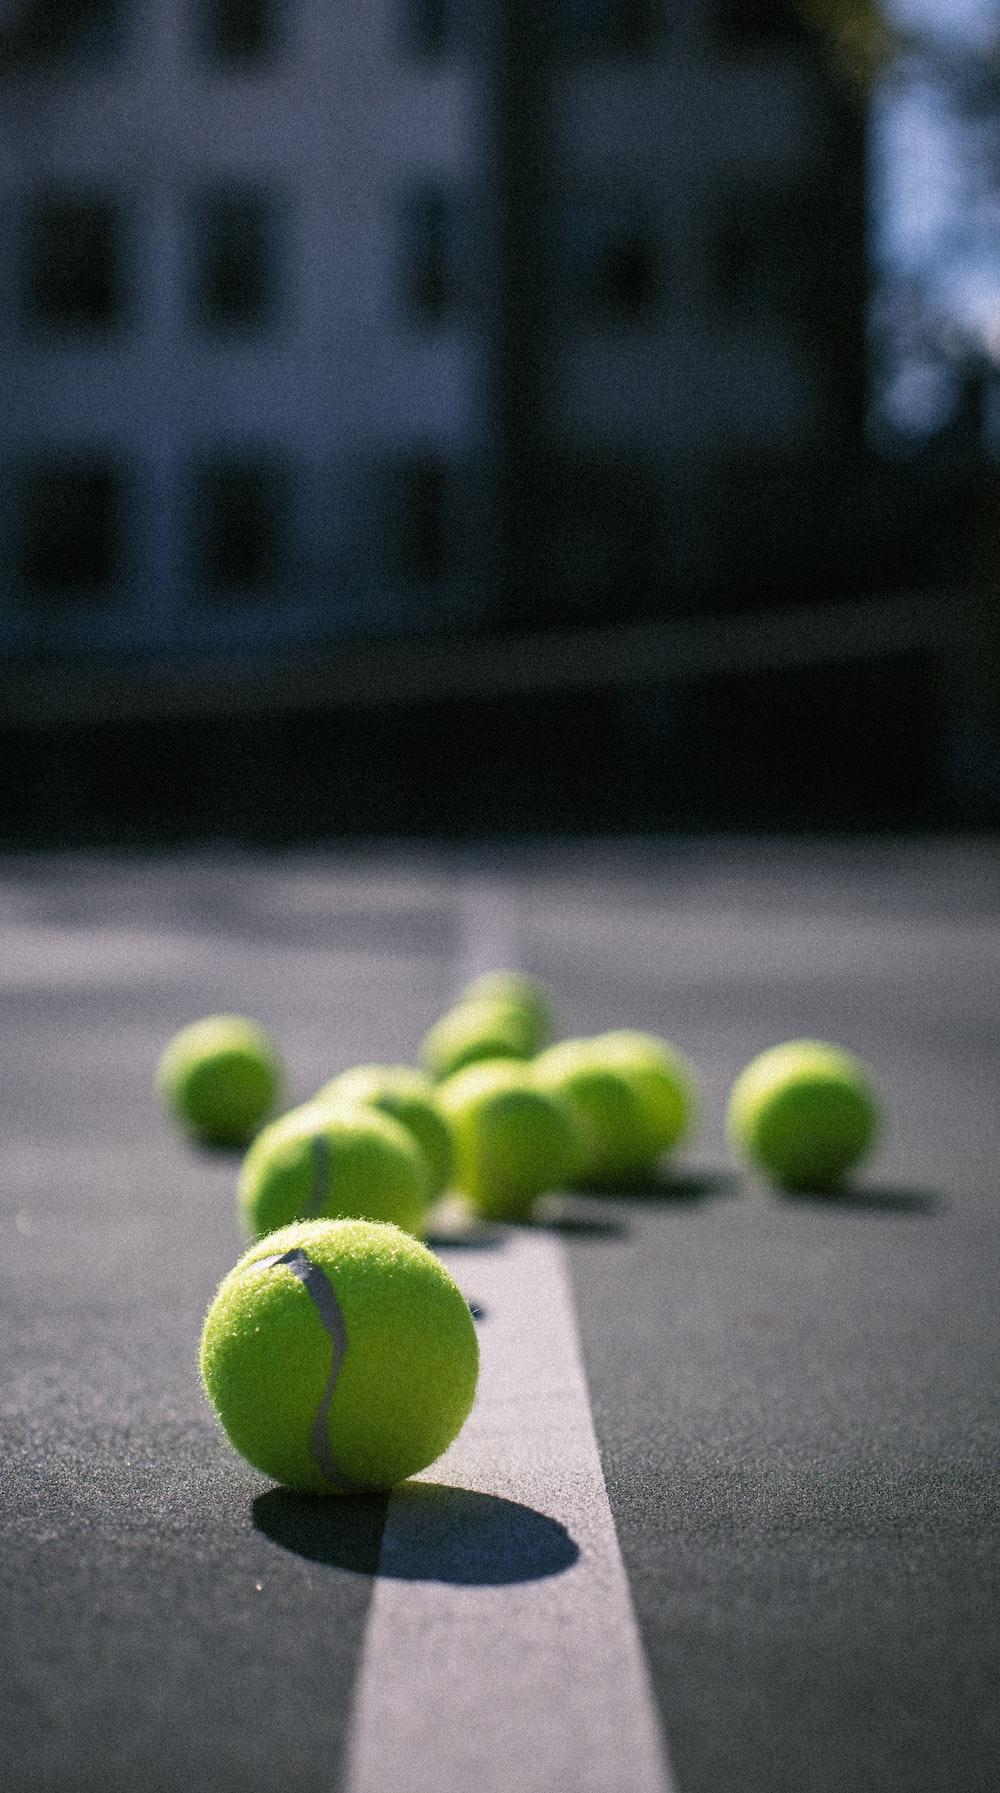 green tennis ball on gray concrete floor